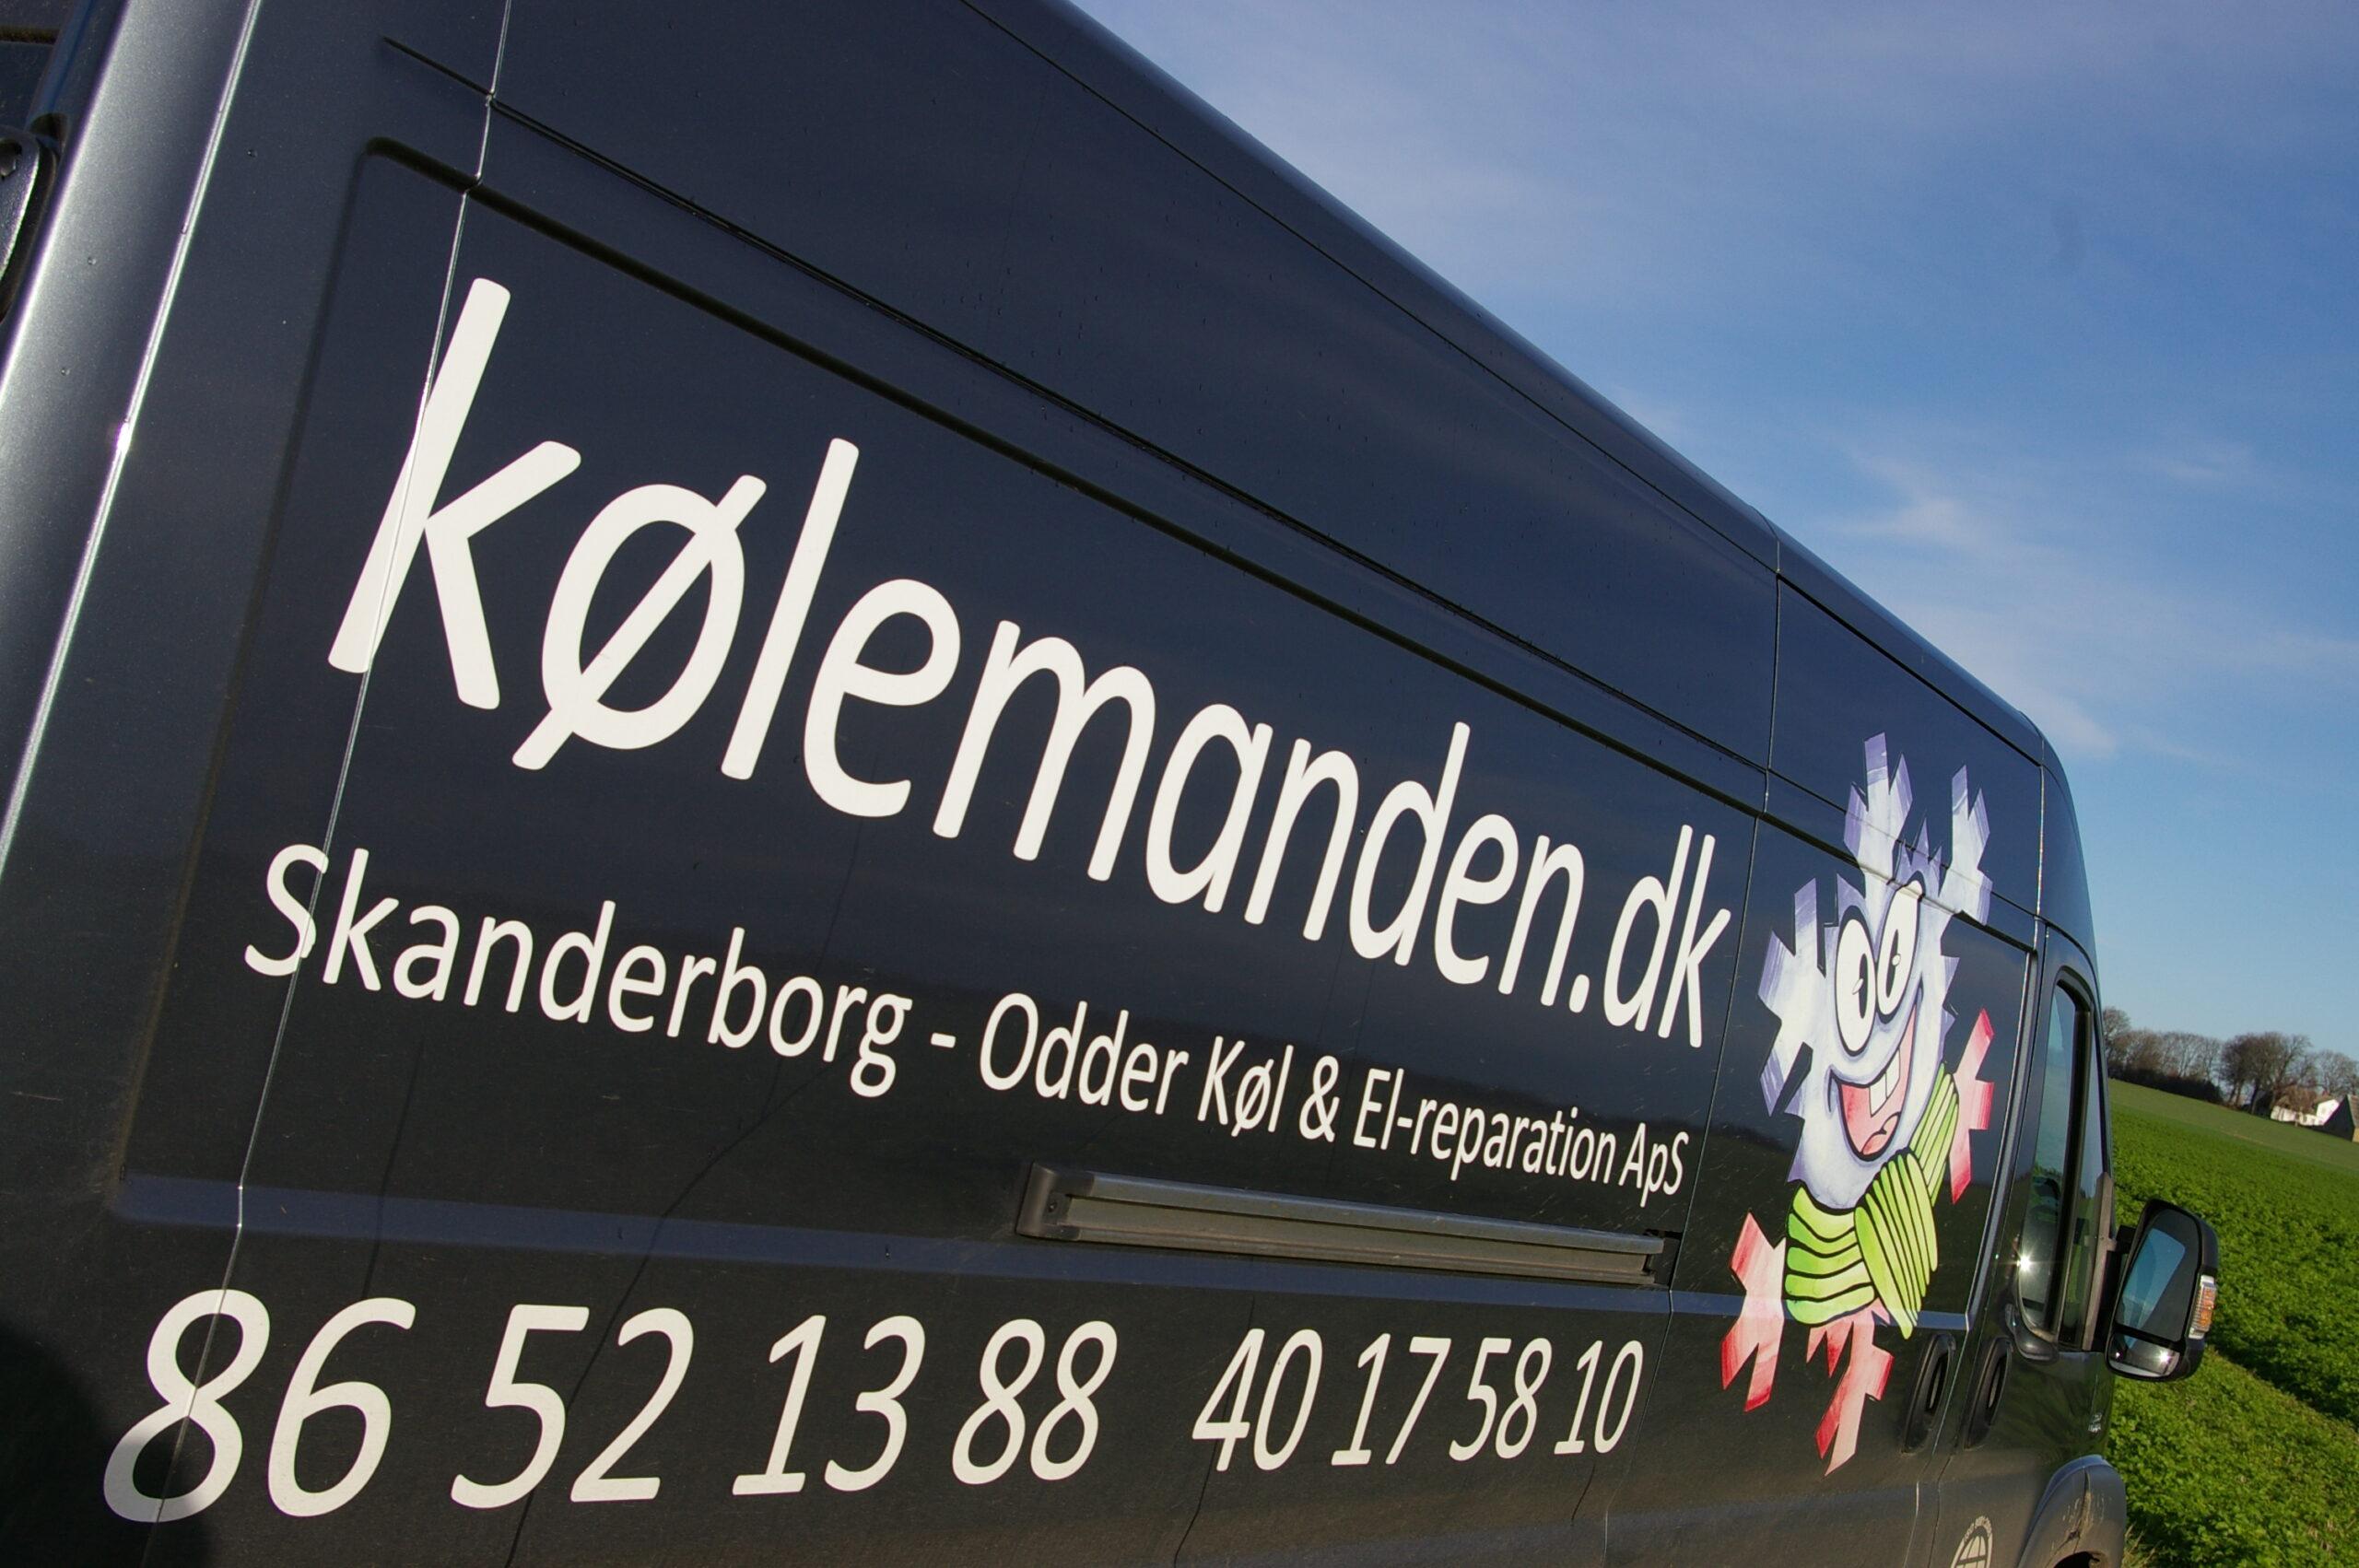 Praktisk info på Kølemandens firmabil